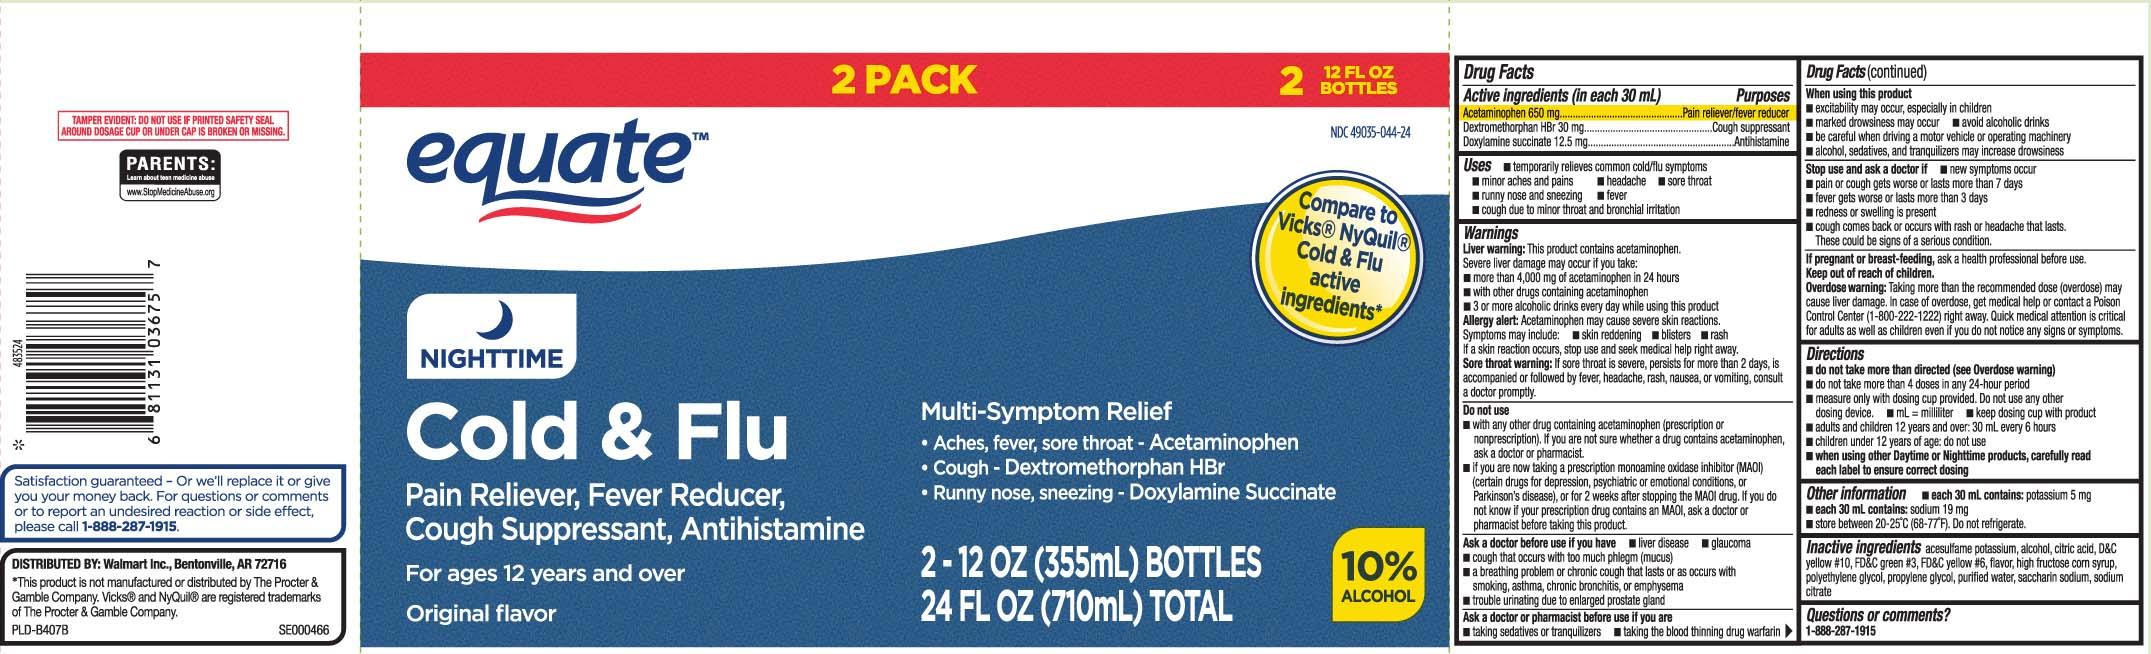 Nitetime Cold And Flu (Acetaminophen, Dextromethorphan Hydrobromide, Doxylamine Succinate) Liquid [Equate (Walmart Stores, Inc.)]